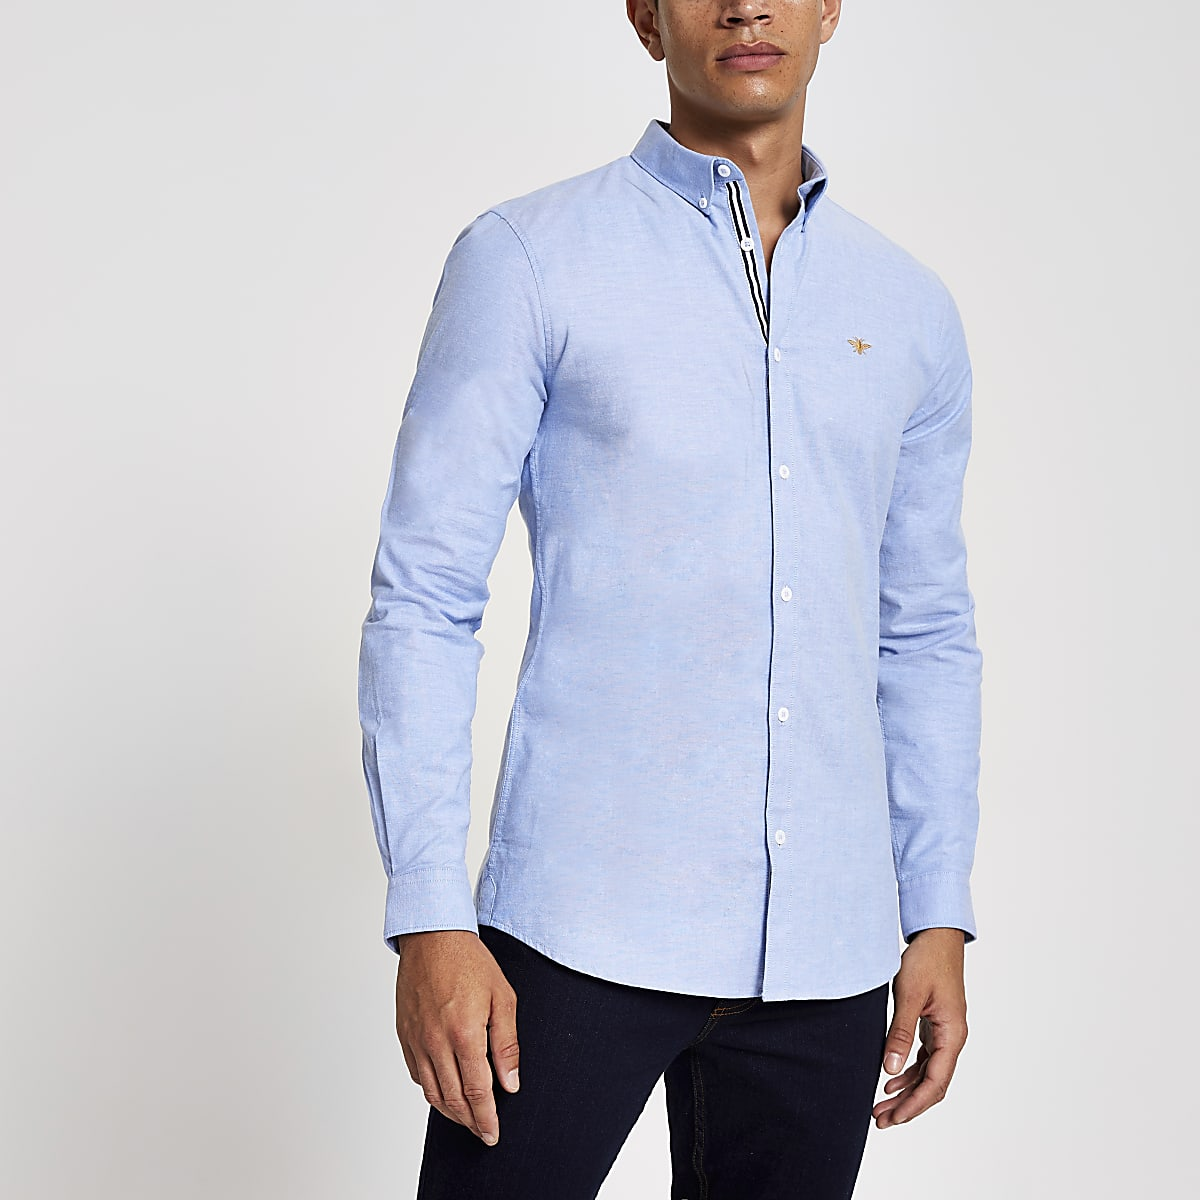 Chemise Oxford brodée coupe ajustée bleue